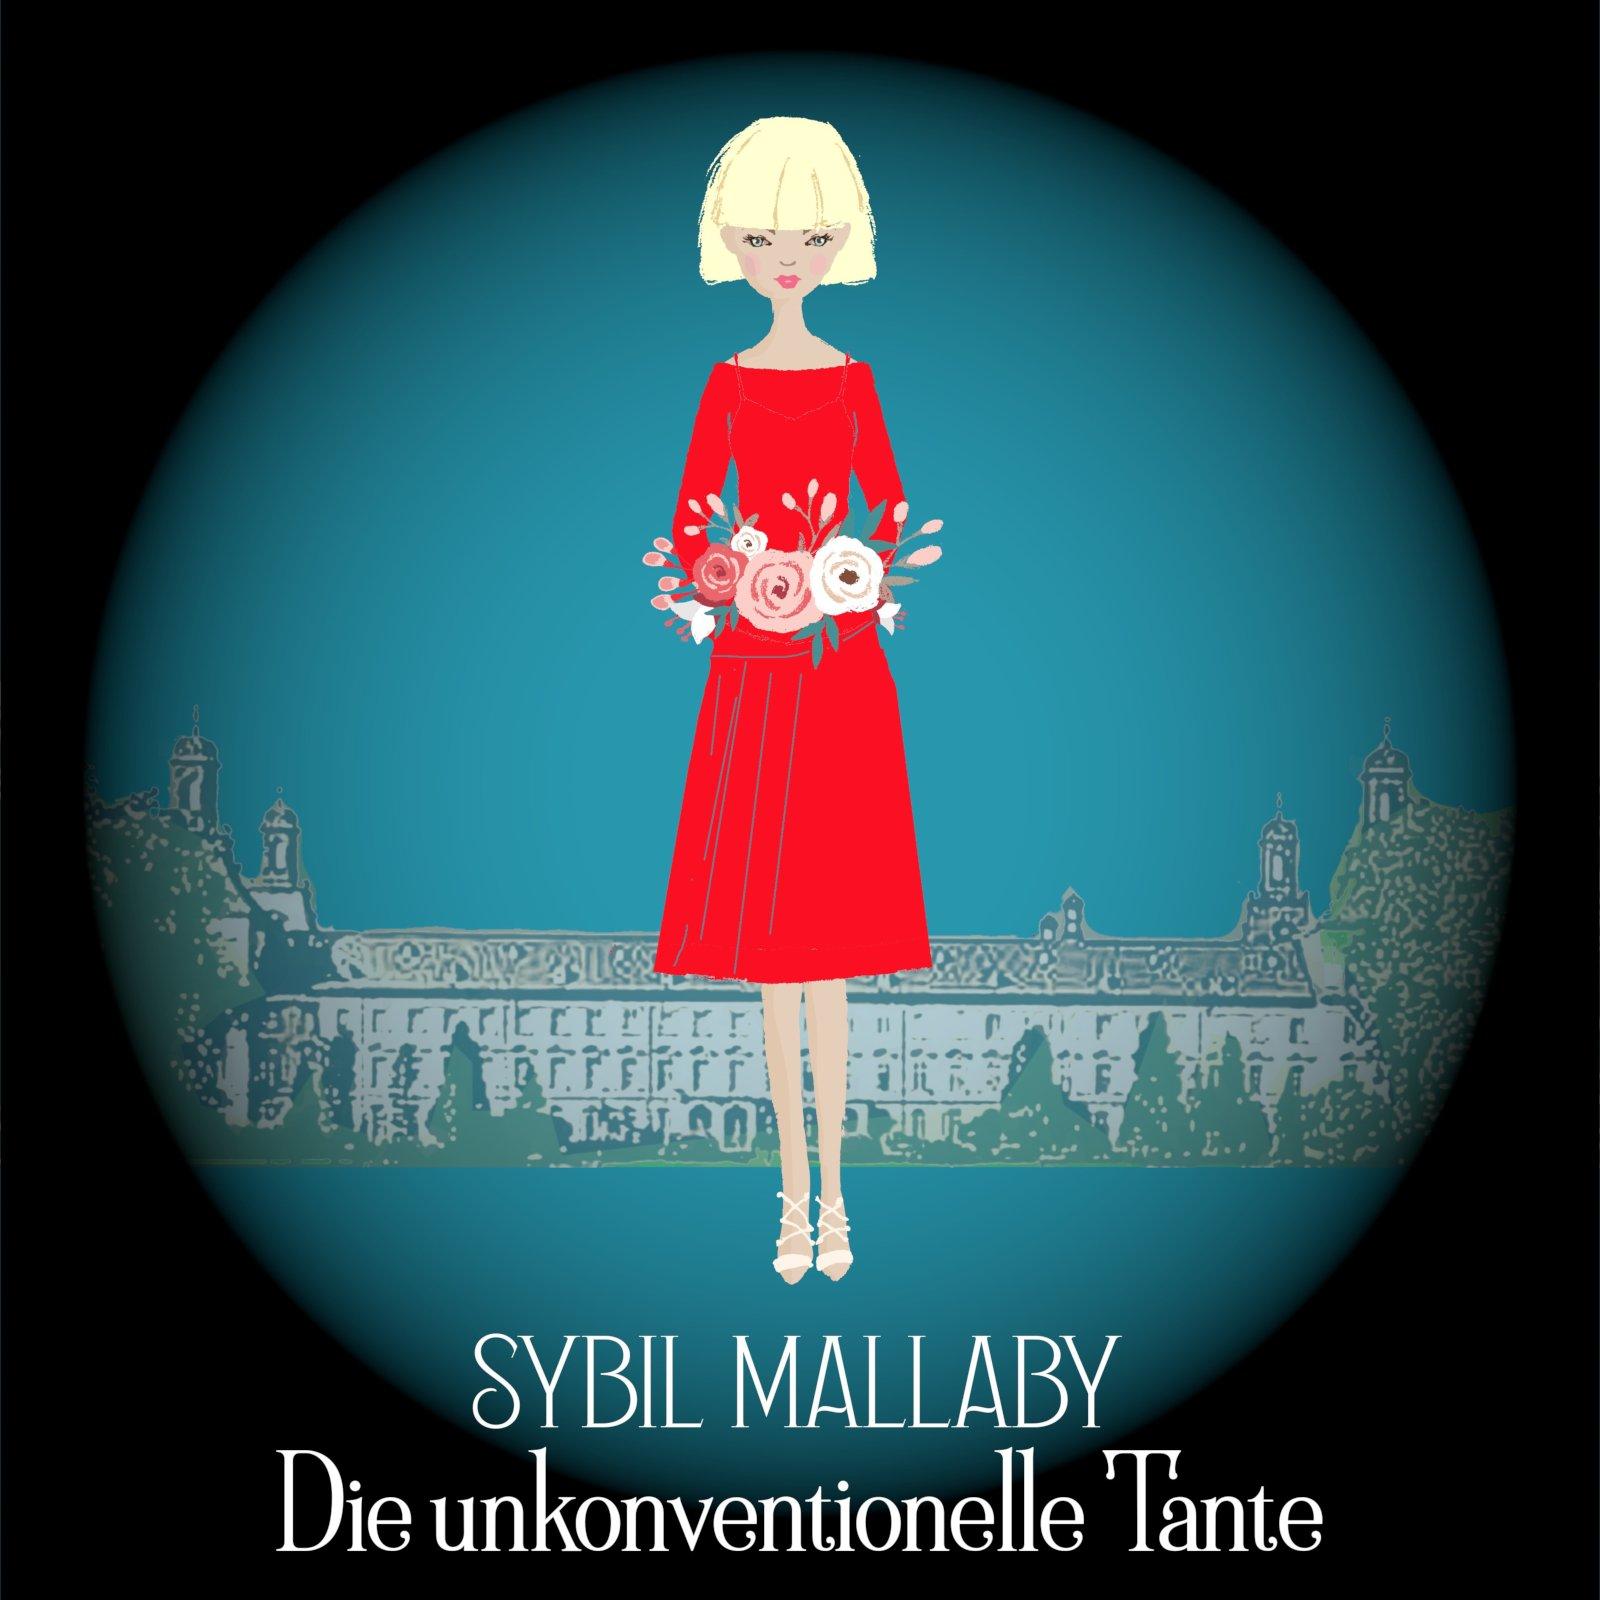 Sybil Alexandra Mallaby